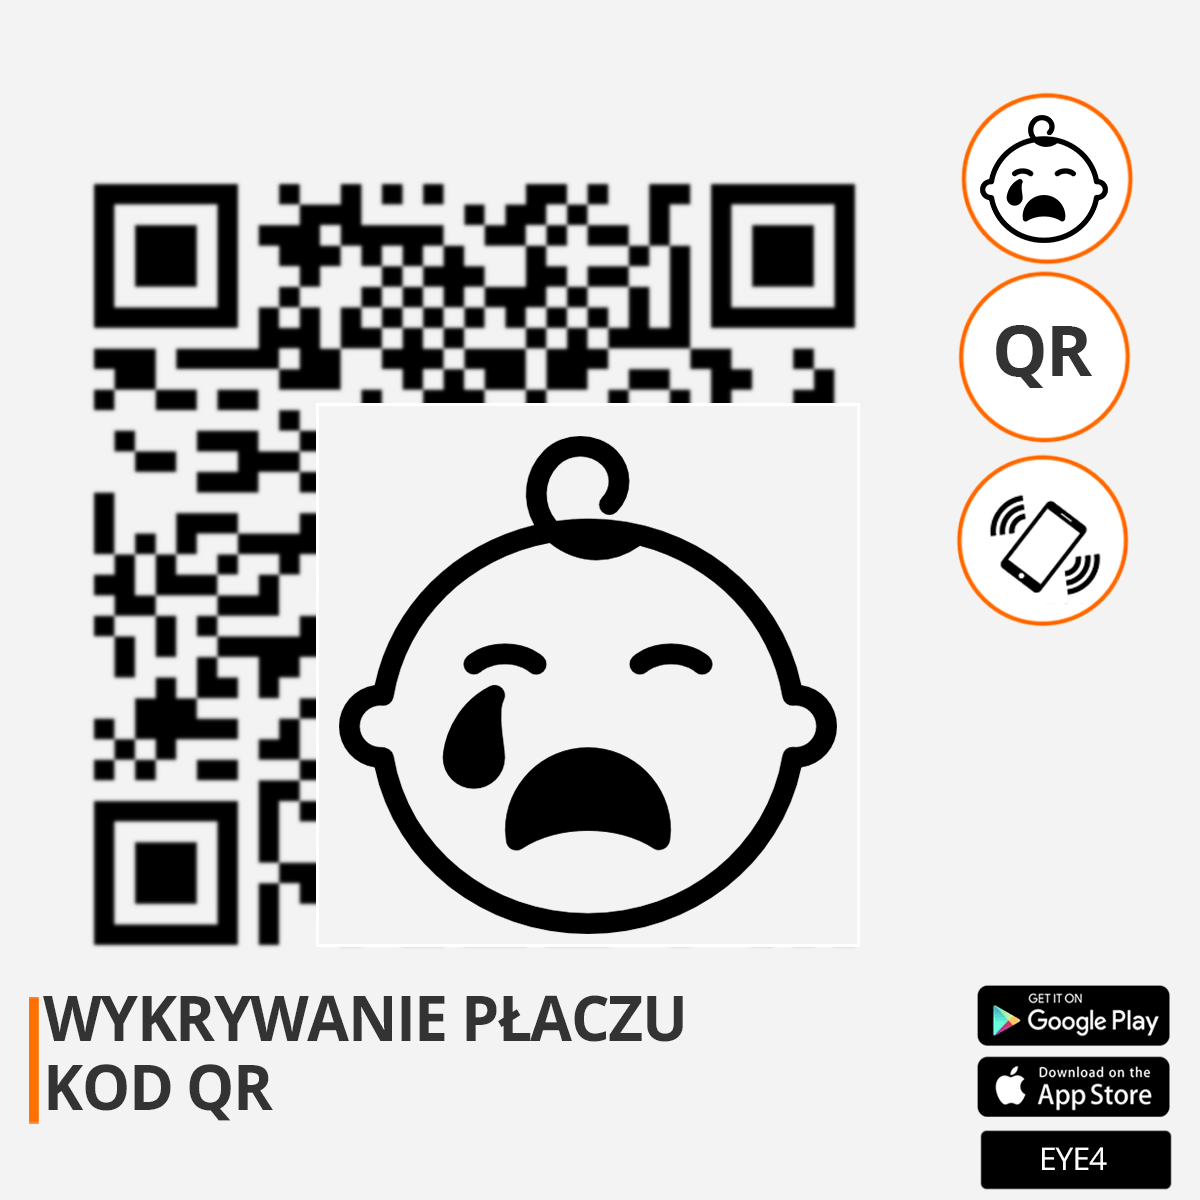 kod qr wykrywanie płaczu orllo.pl orllo.pl